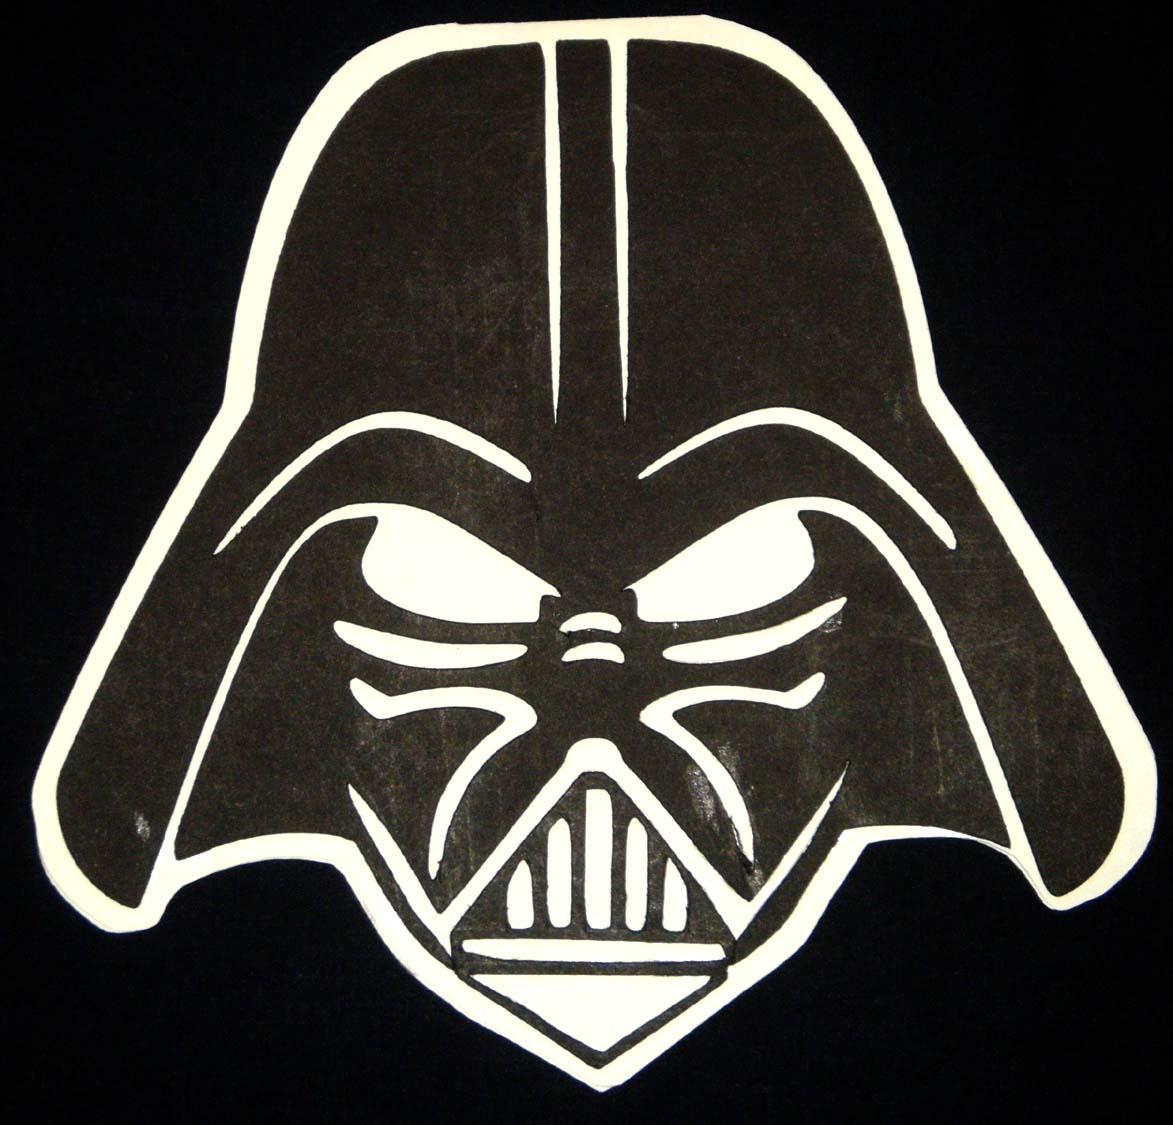 Darth Vader Helmet Silhouette Www Imgkid Com The Image